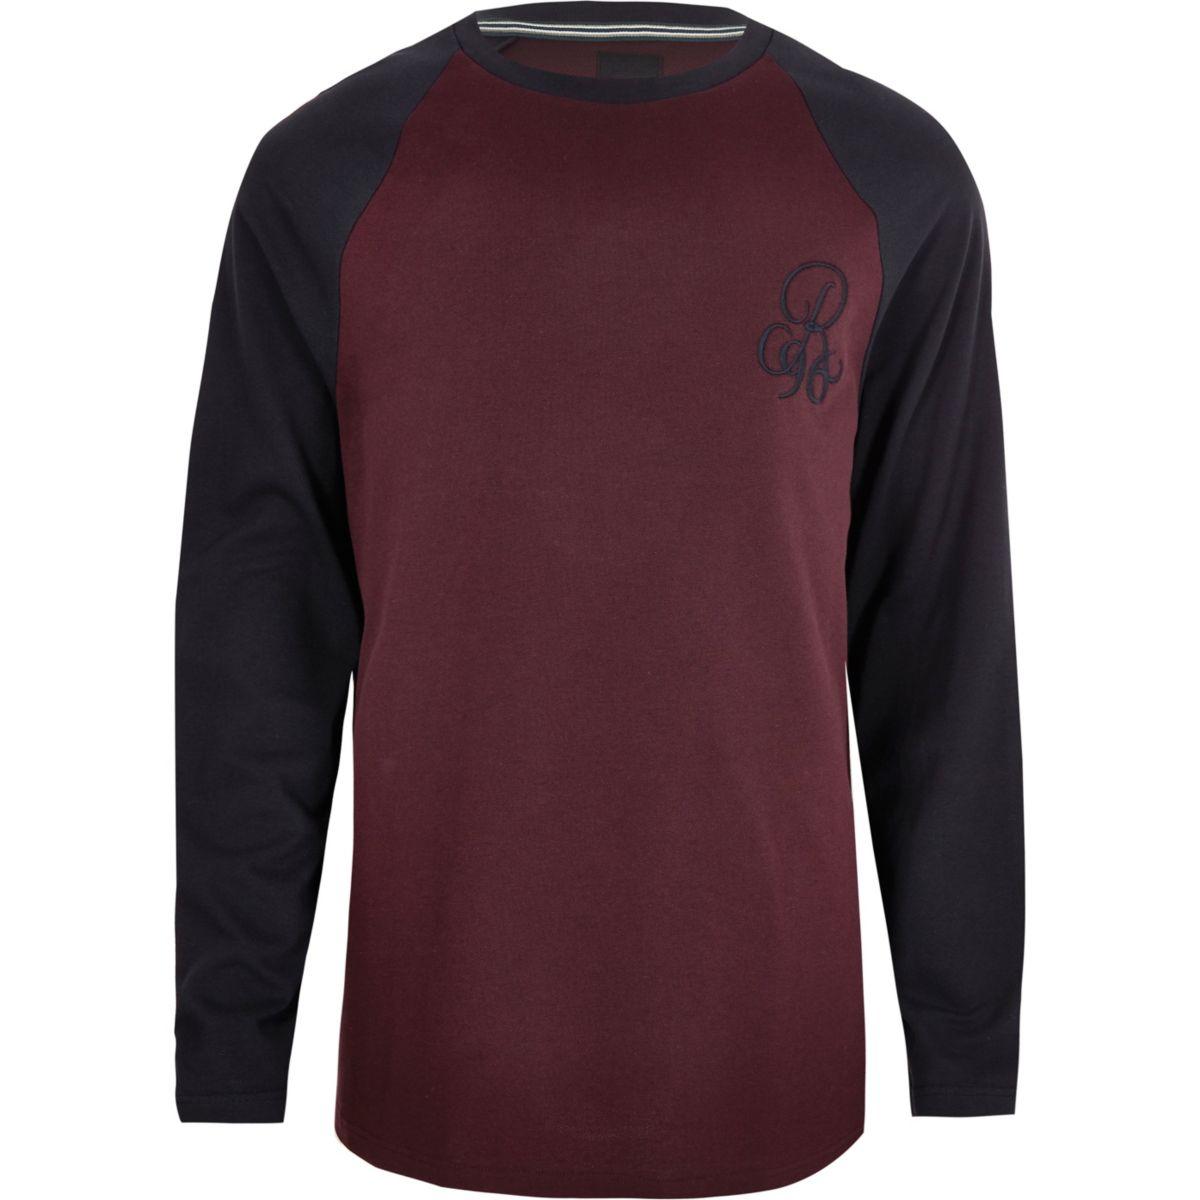 Big & Tall burgundy muscle fit raglan T-shirt